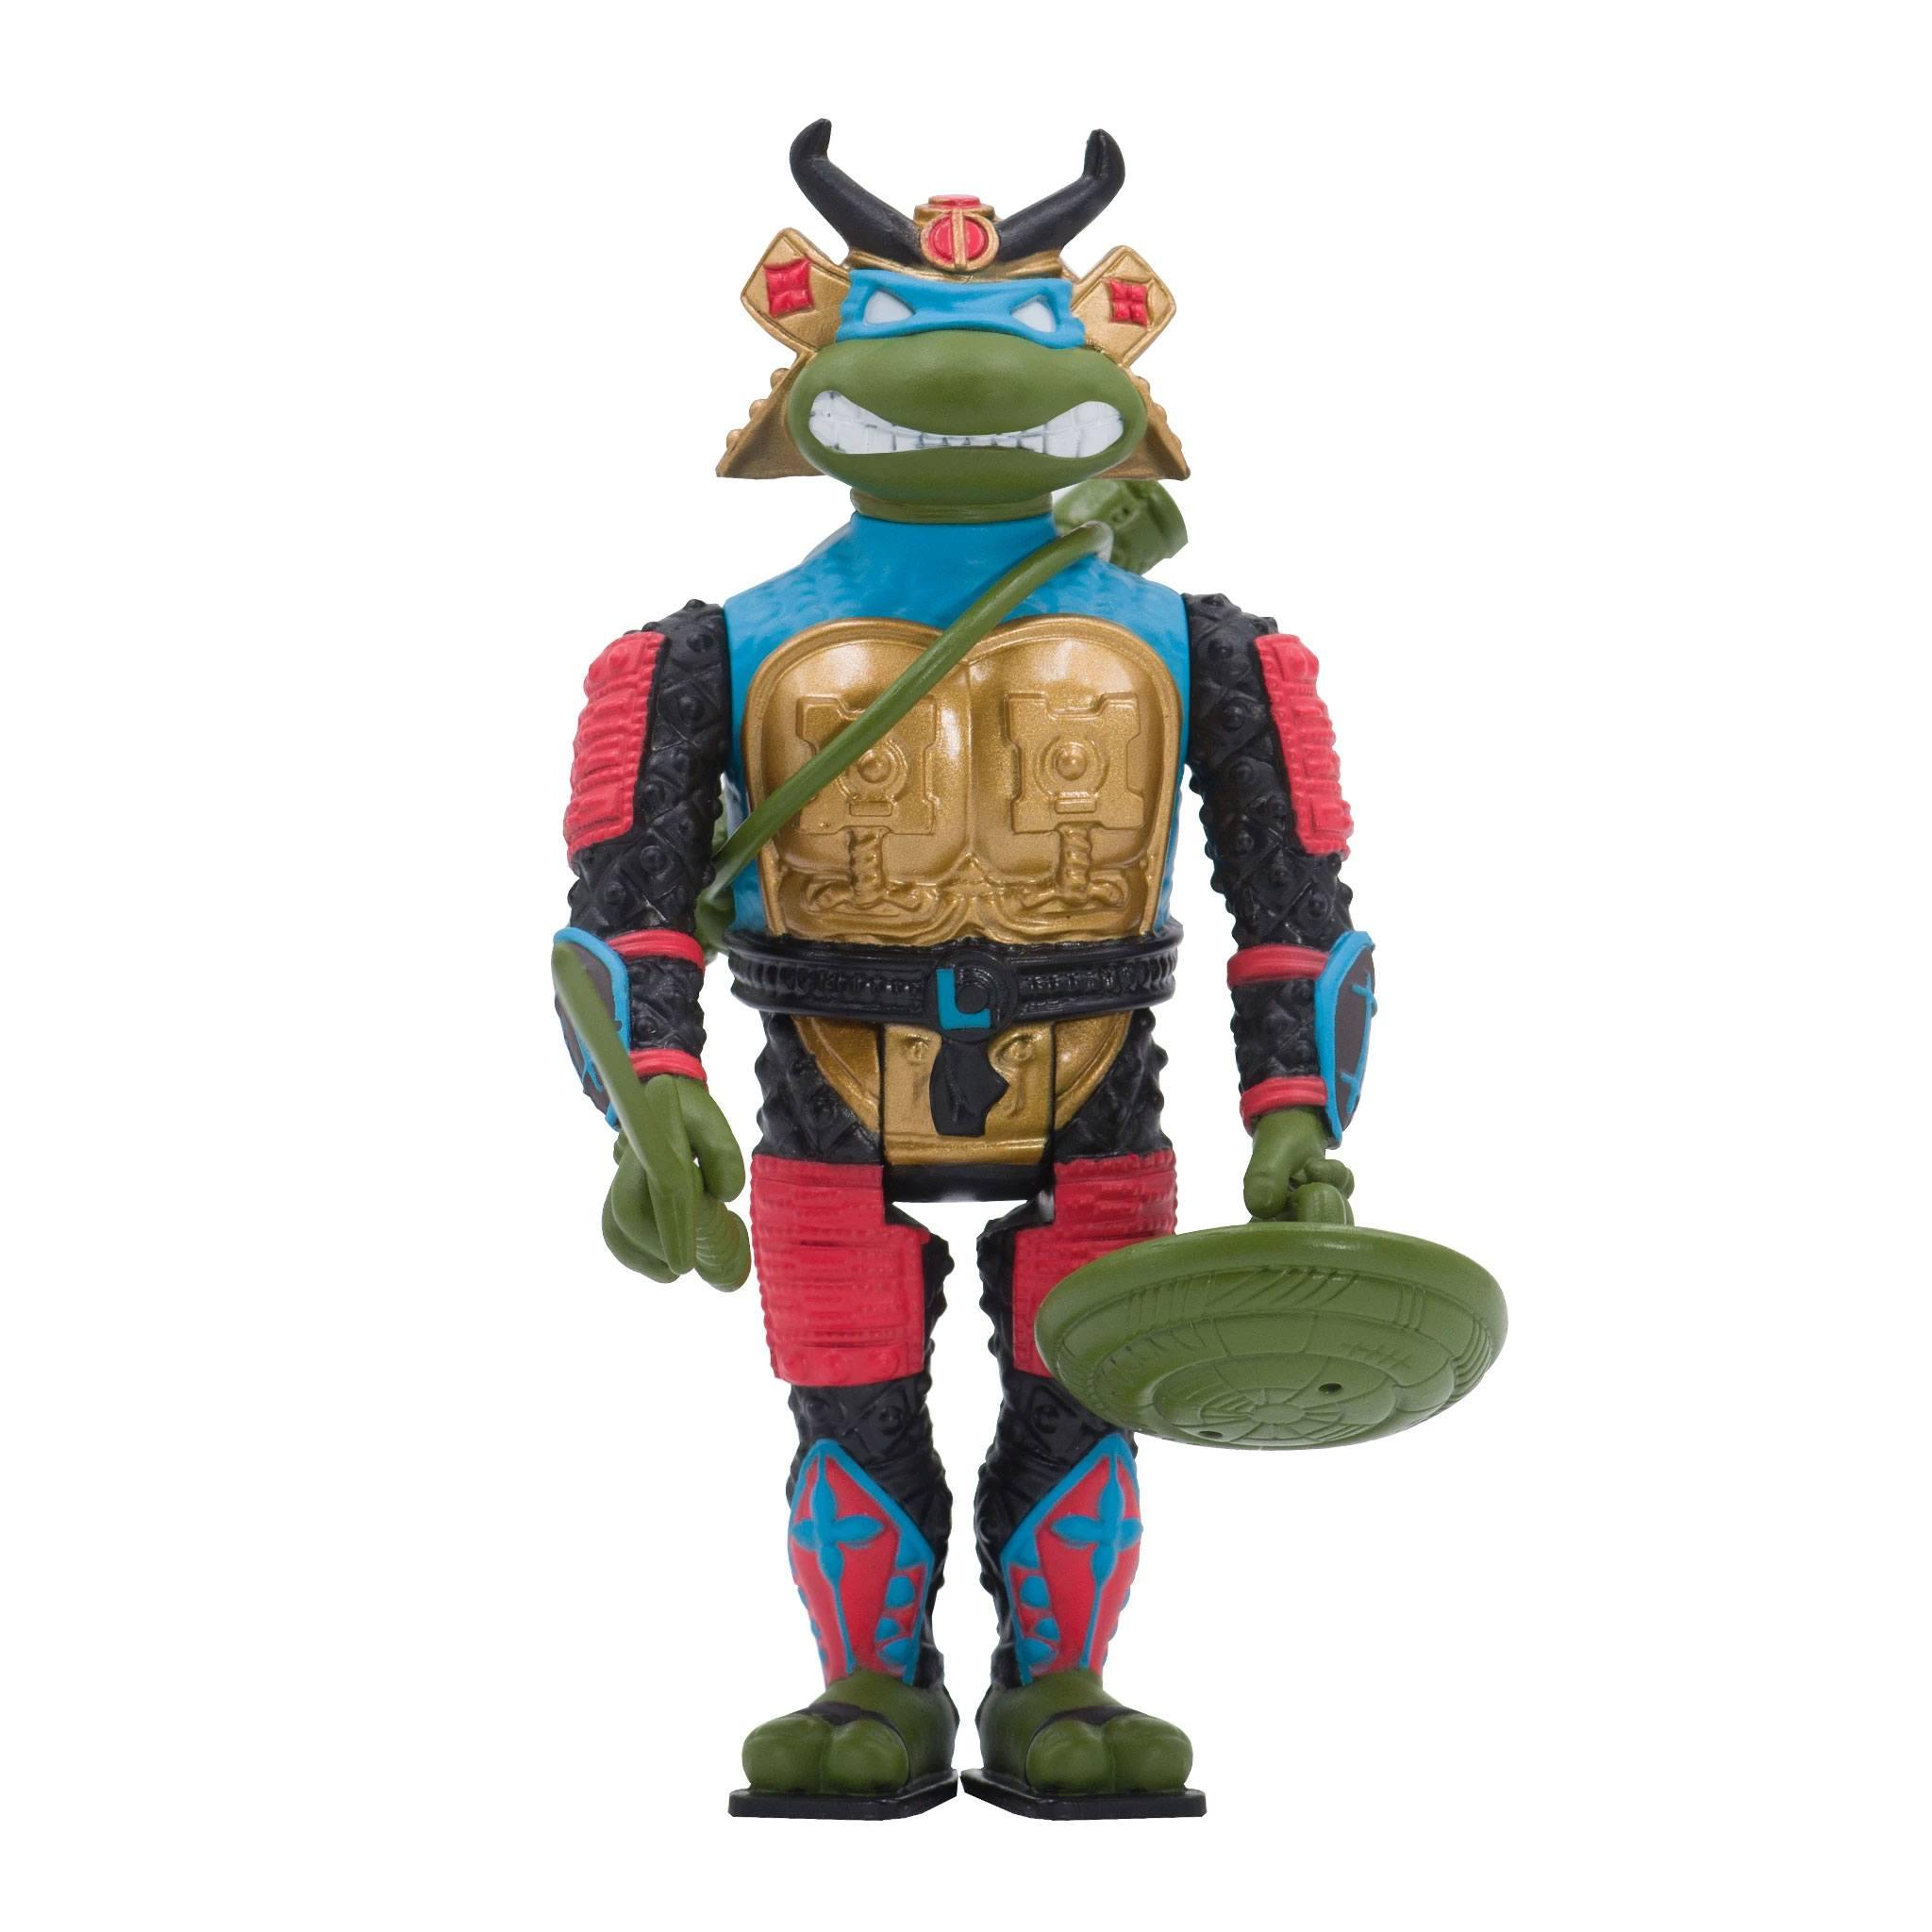 *PREORDER* Teenage Mutant Ninja Turtles ReAction: SAMURAI LEONARDO by Super7